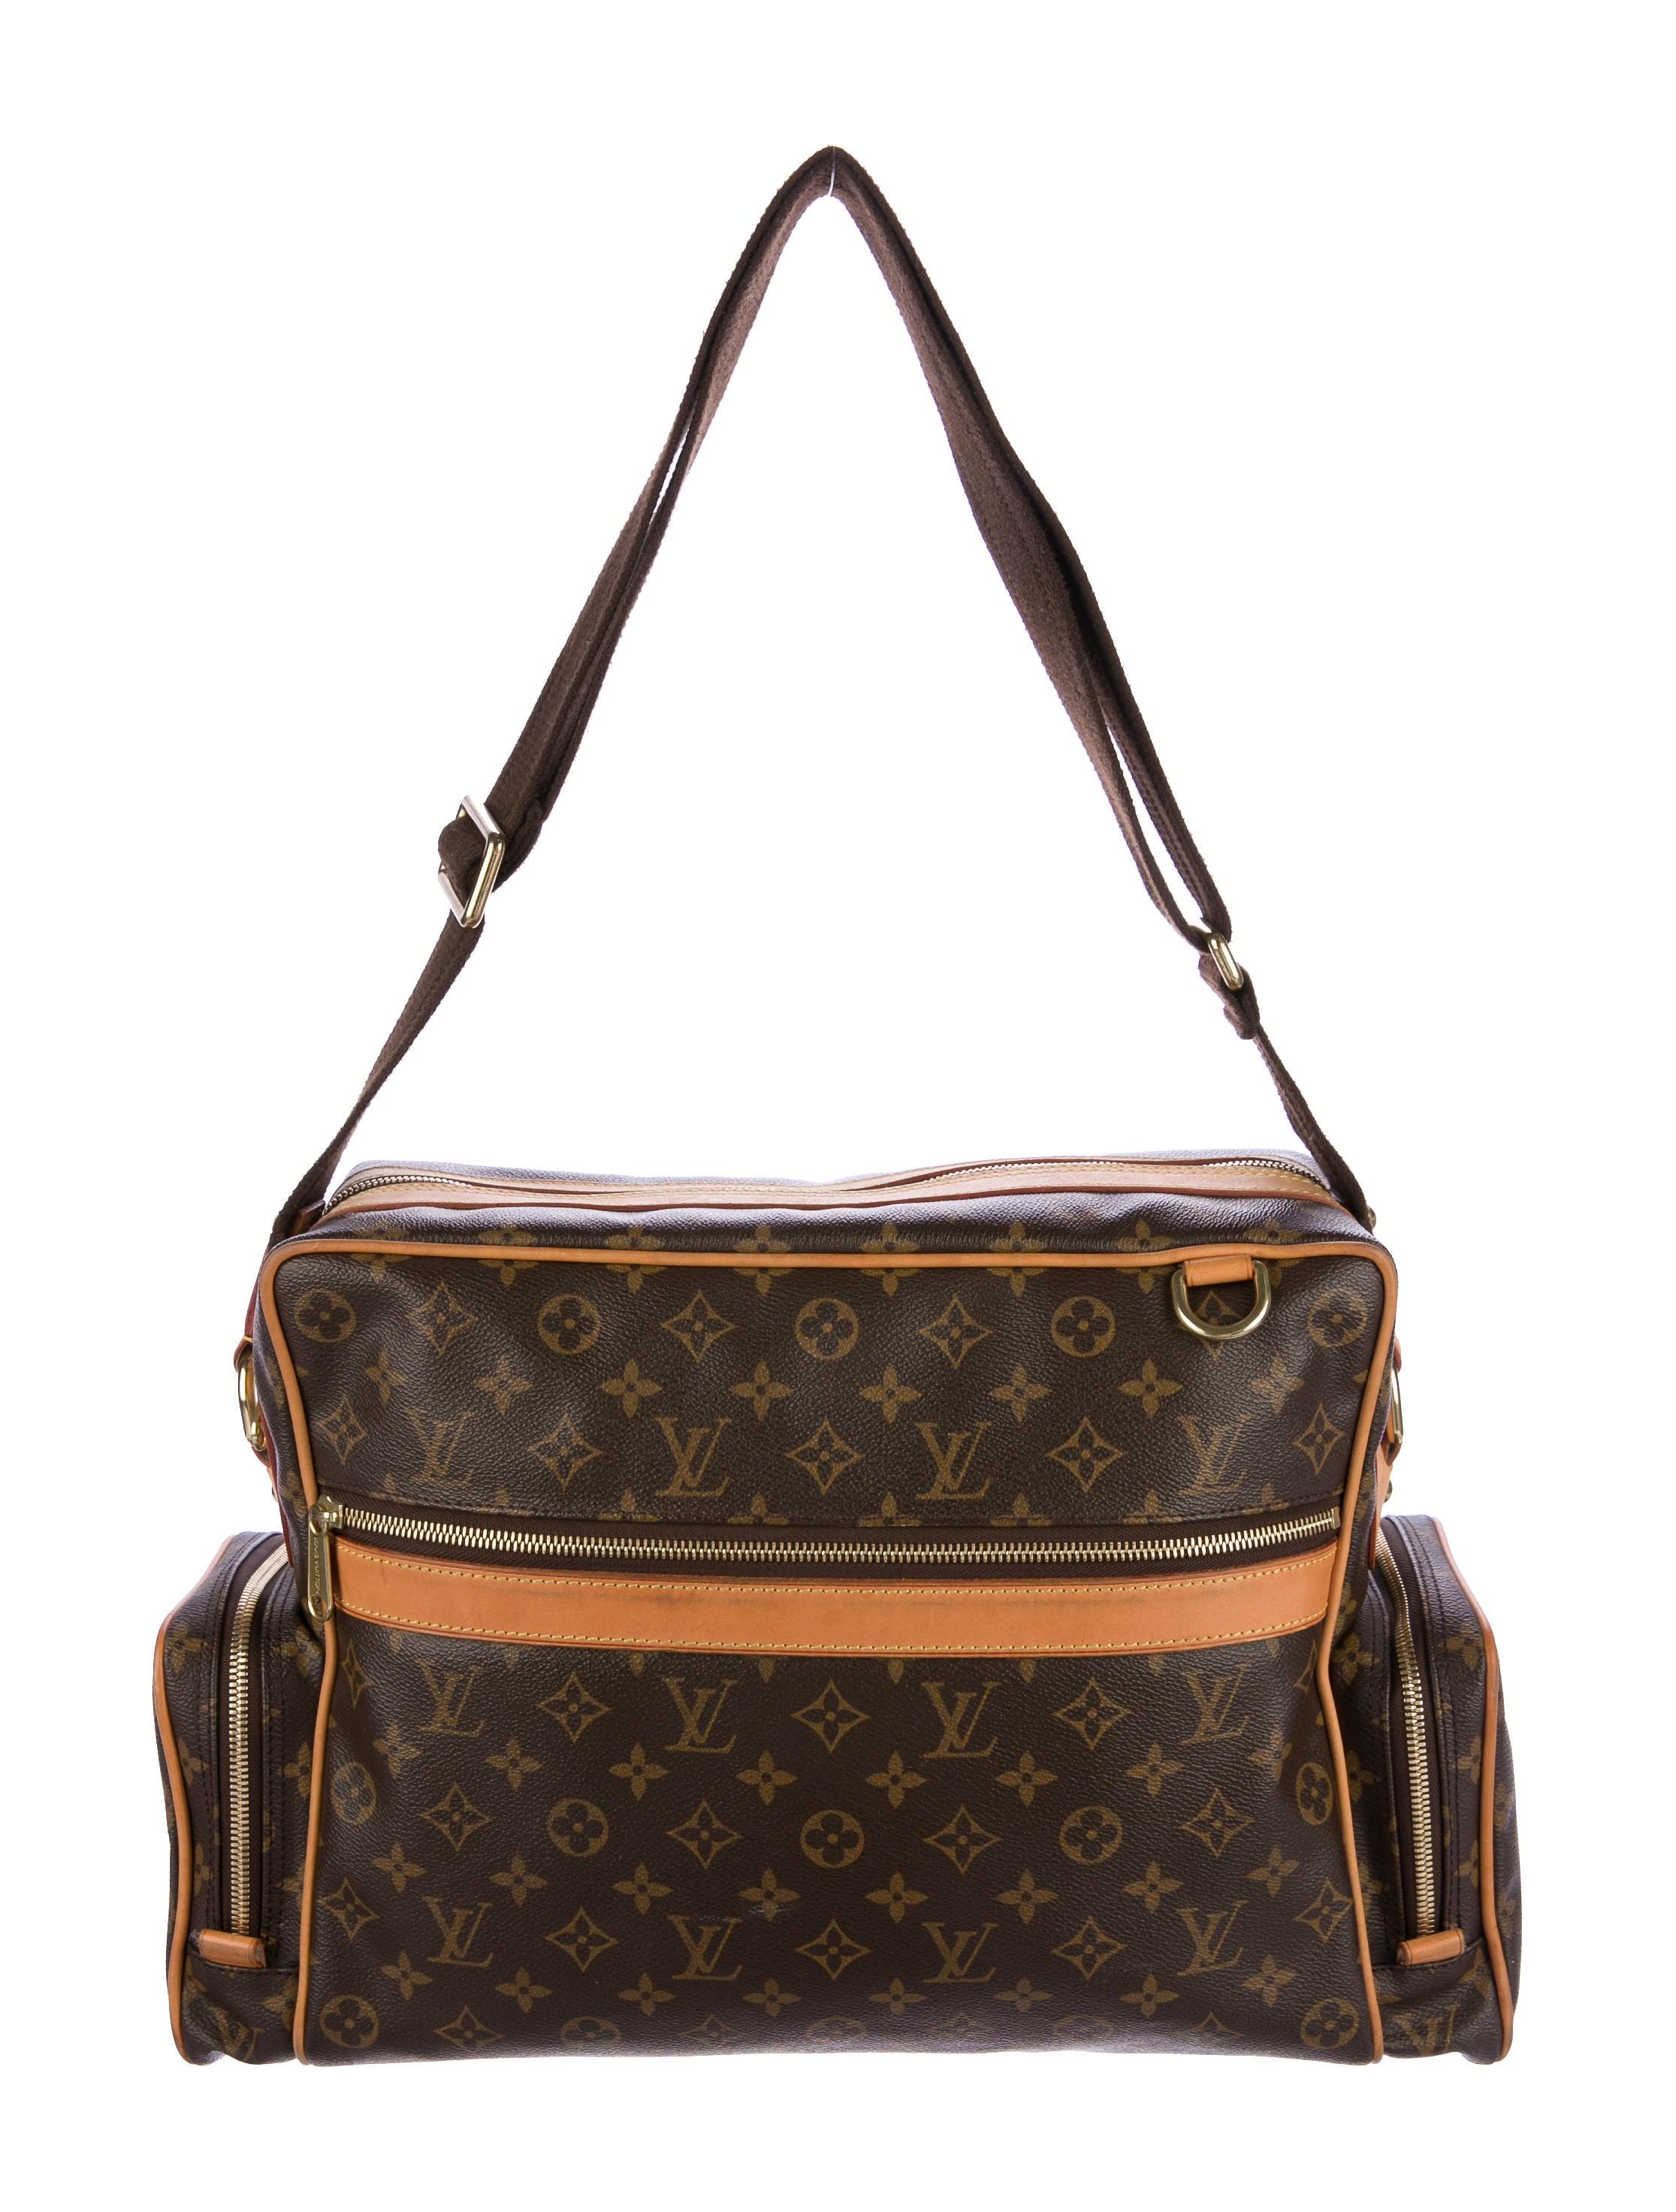 Sac Louis Vuitton Vrai : Louis vuitton monogram sac squash handbags lou